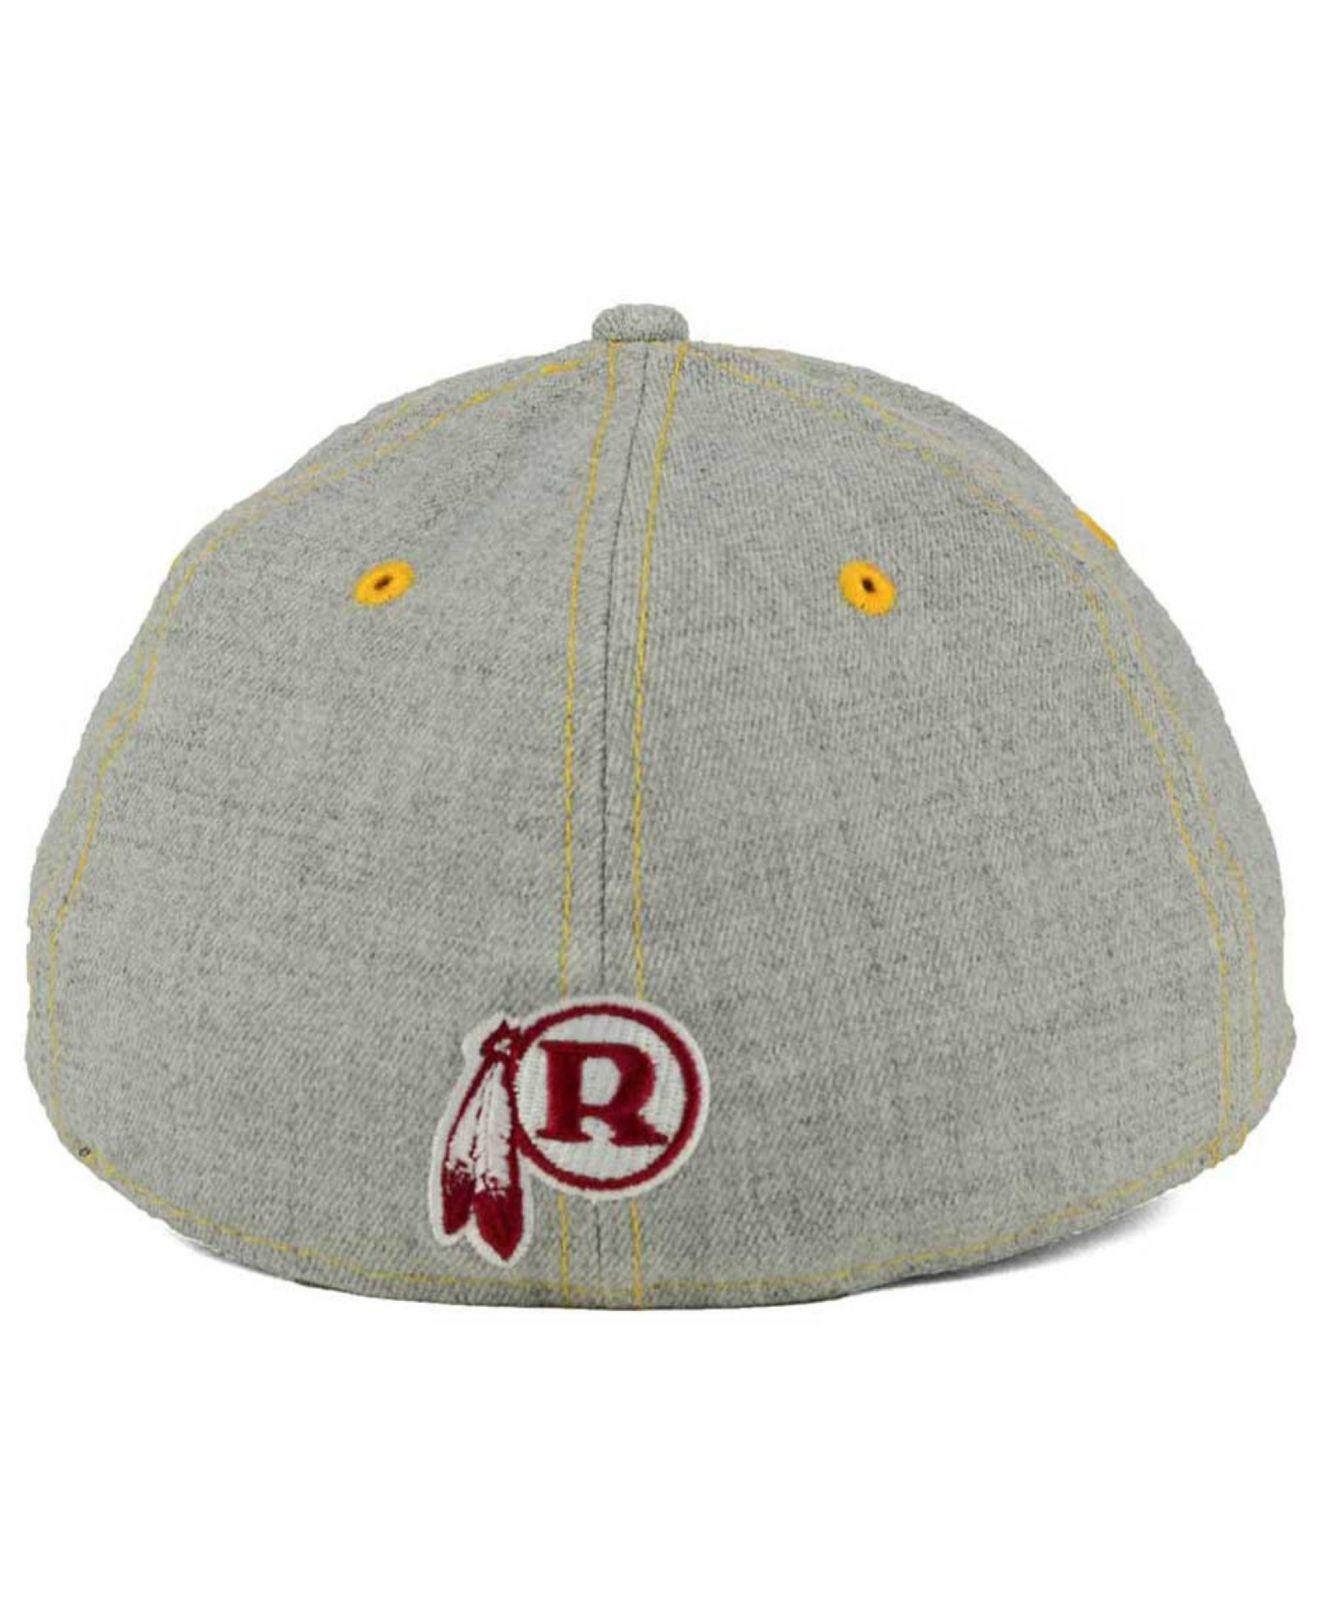 Youth Washington Redskins Gray Classic Fade Short & Long Sleeve T-Shirt Combo Pack